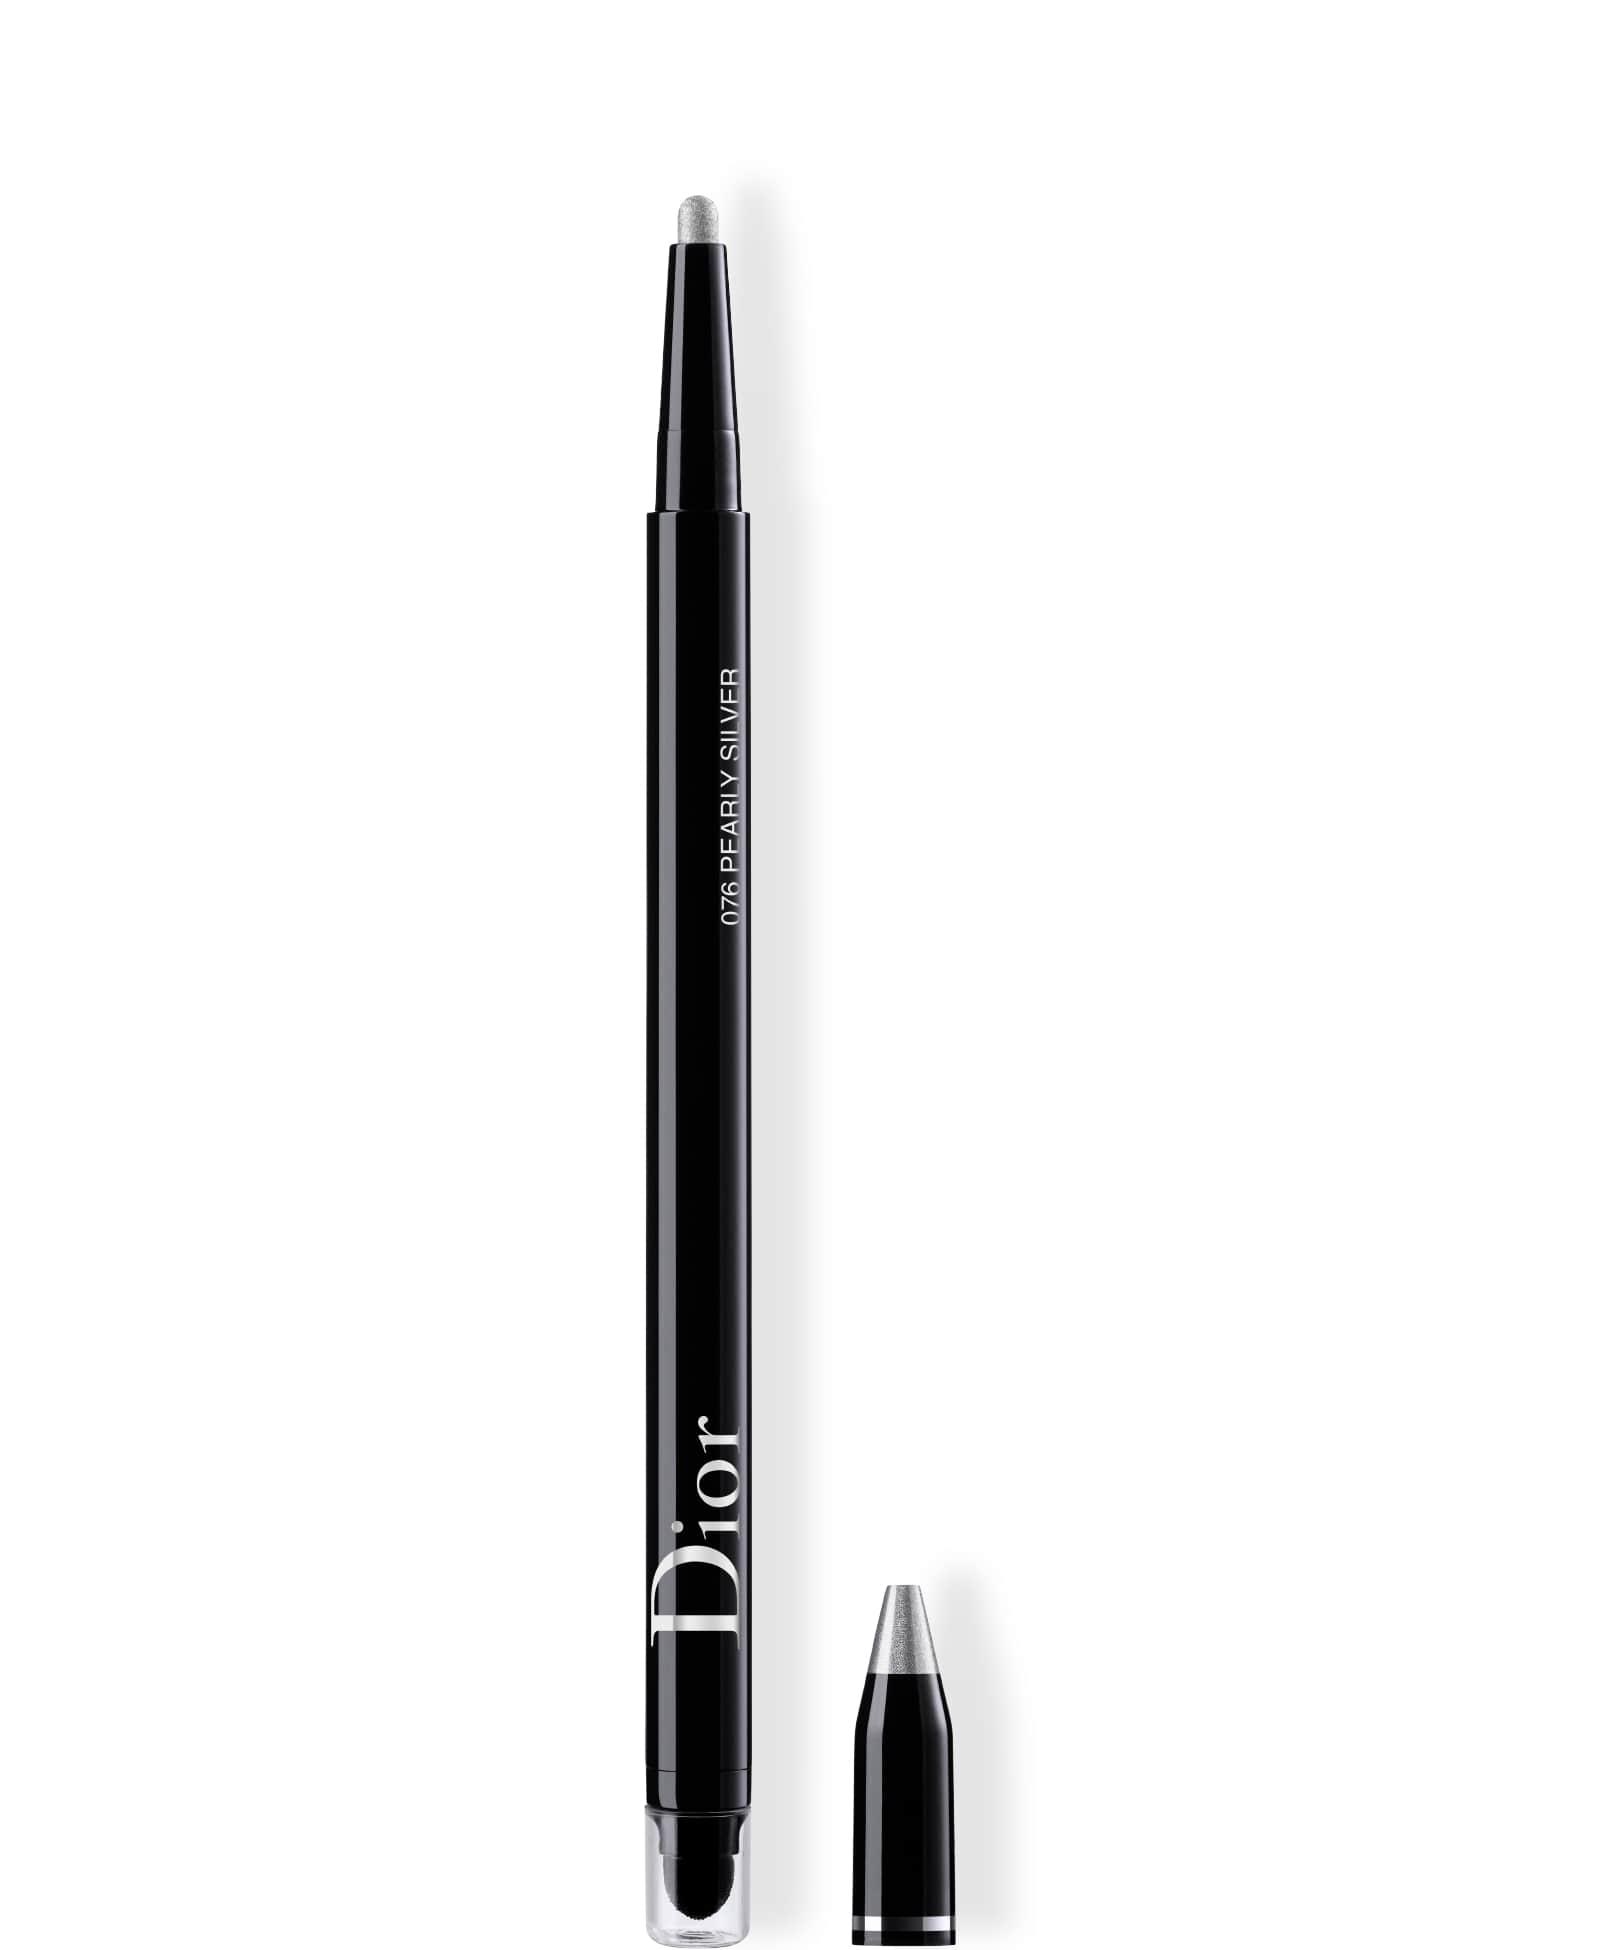 DIOR Diorshow 24H Stylo Pencil, 076 pearly silver